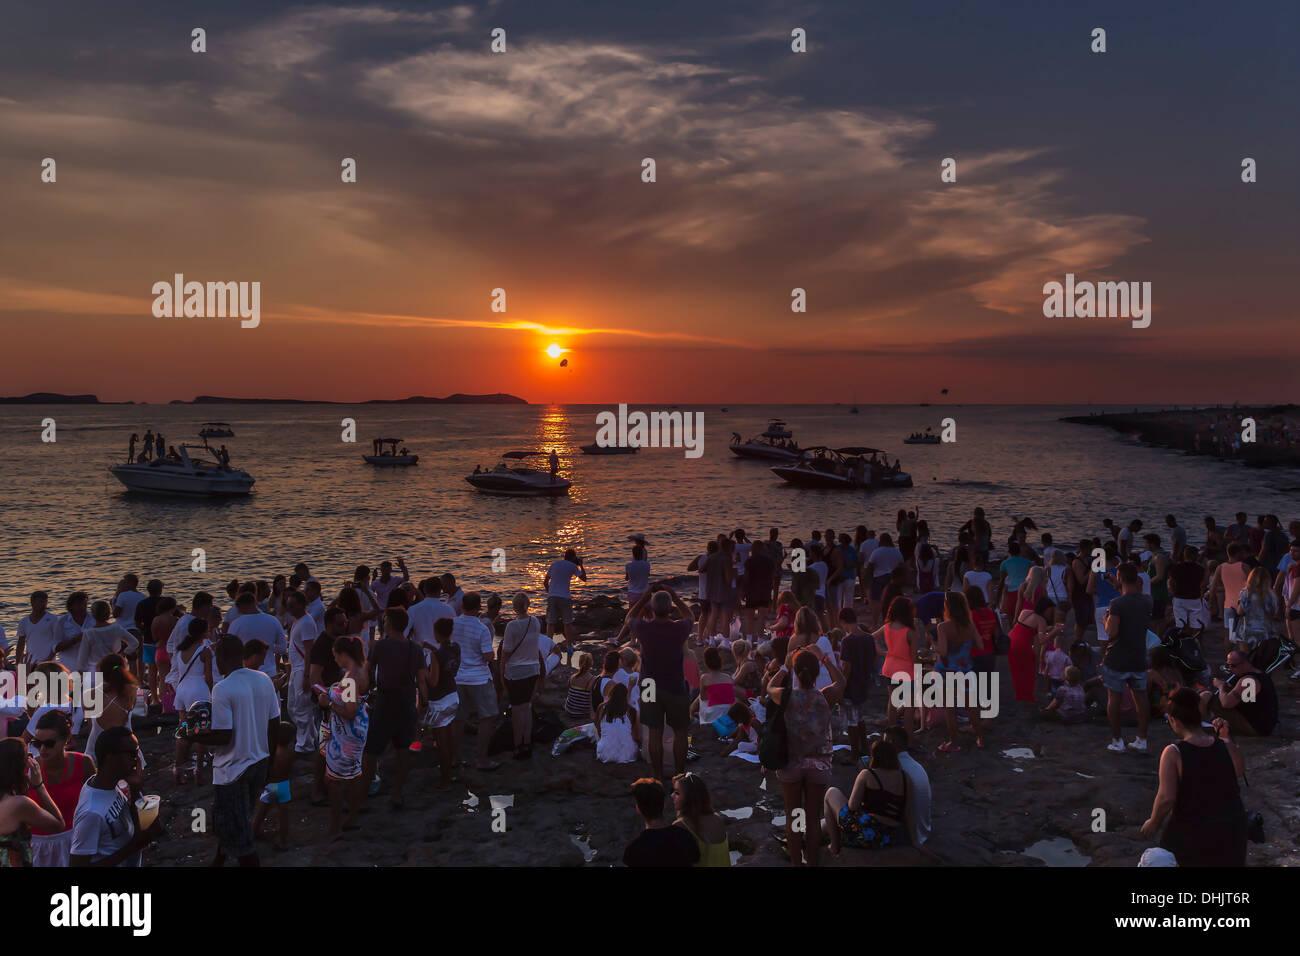 Spain, Balearic Islands, Ibiza, Sant Antoni, people watching sunset at Cafe del Mar - Stock Image